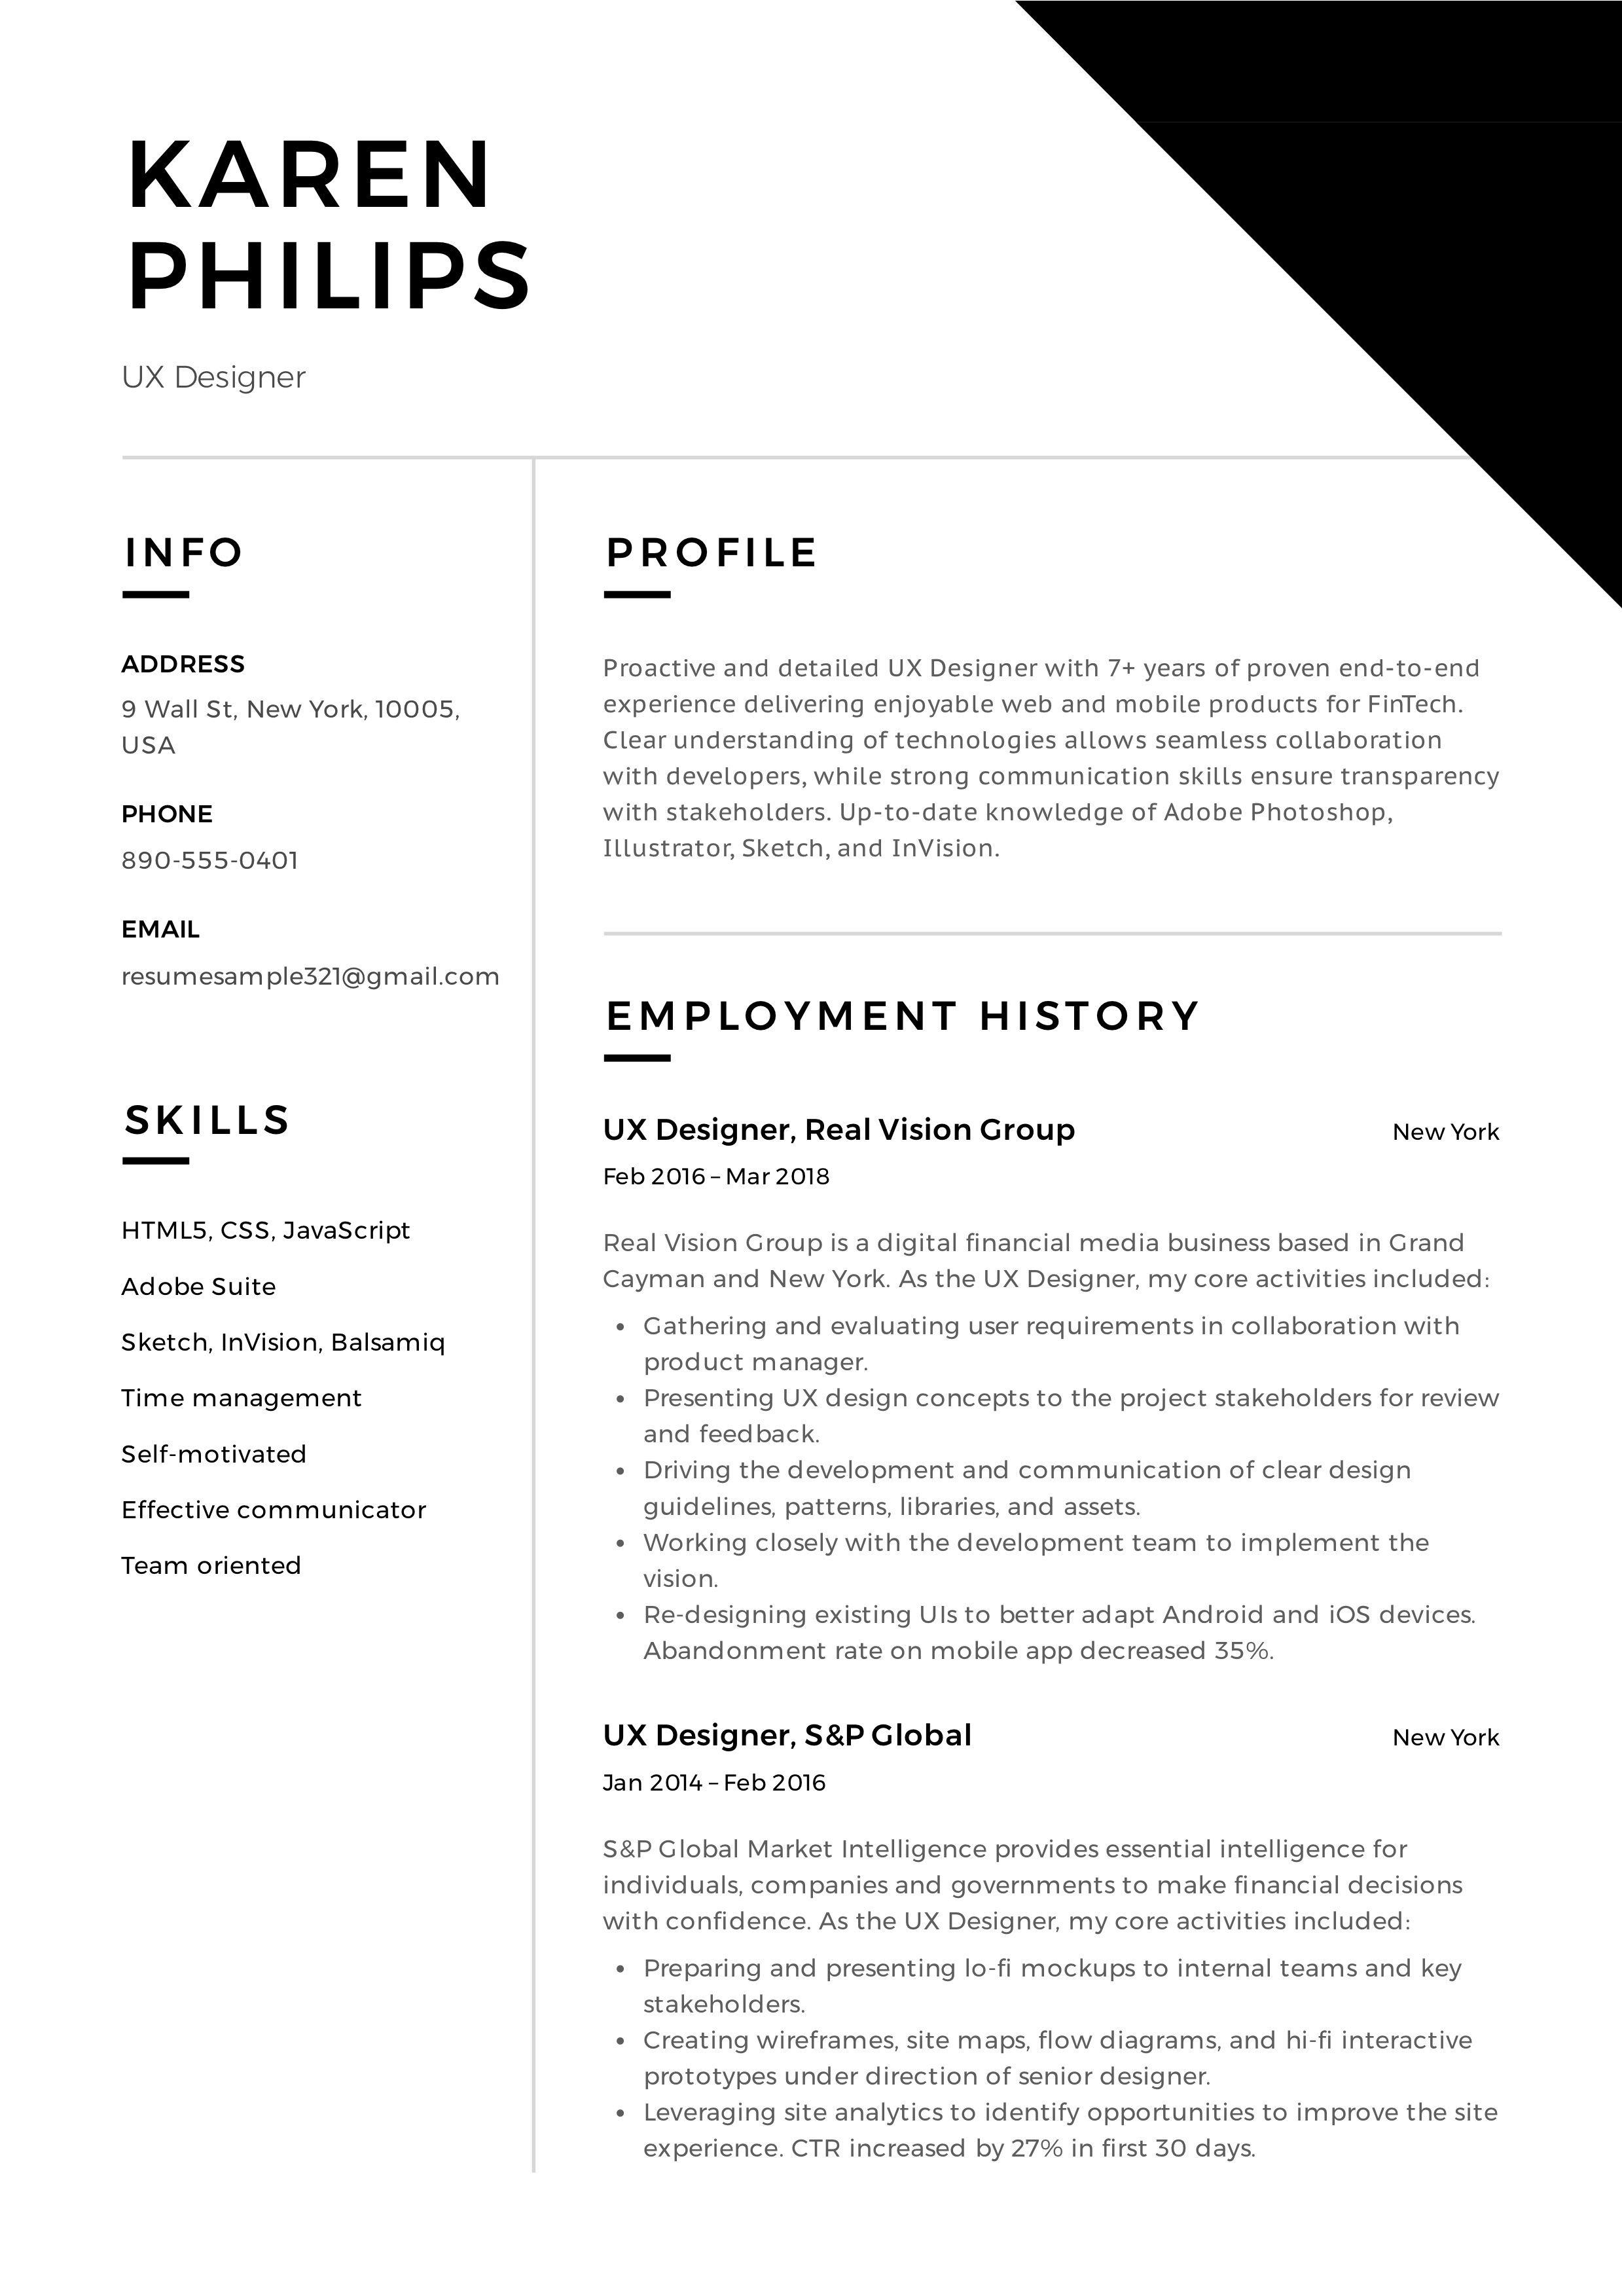 UX Designer Resume & Guide Resume examples, Resume guide